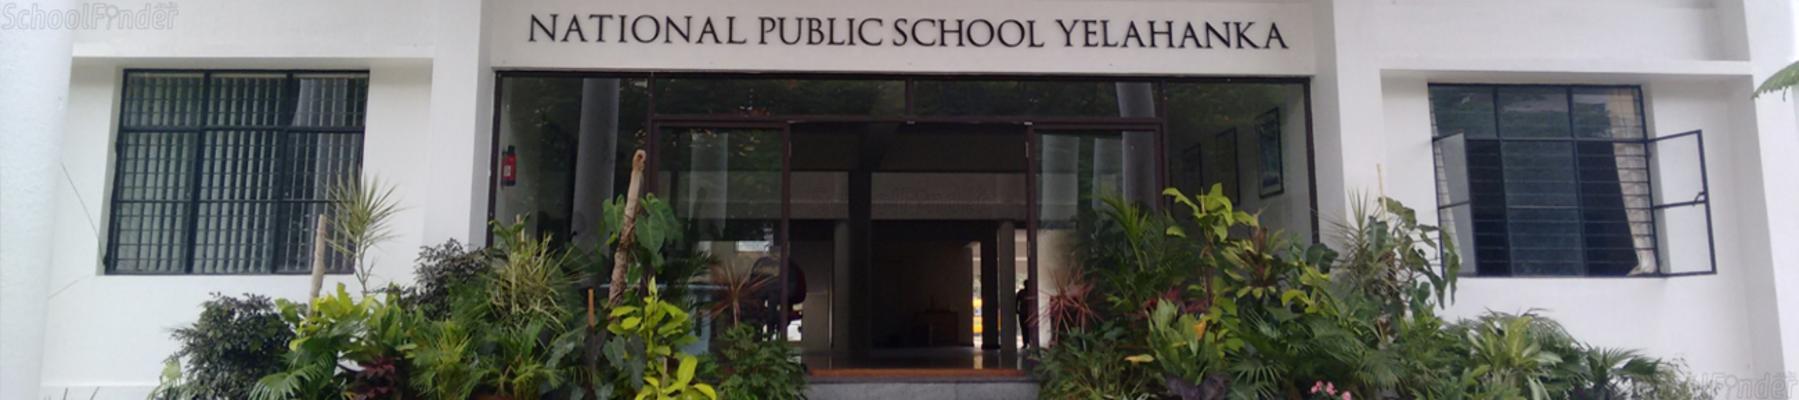 National Public School Yelahanka - cover